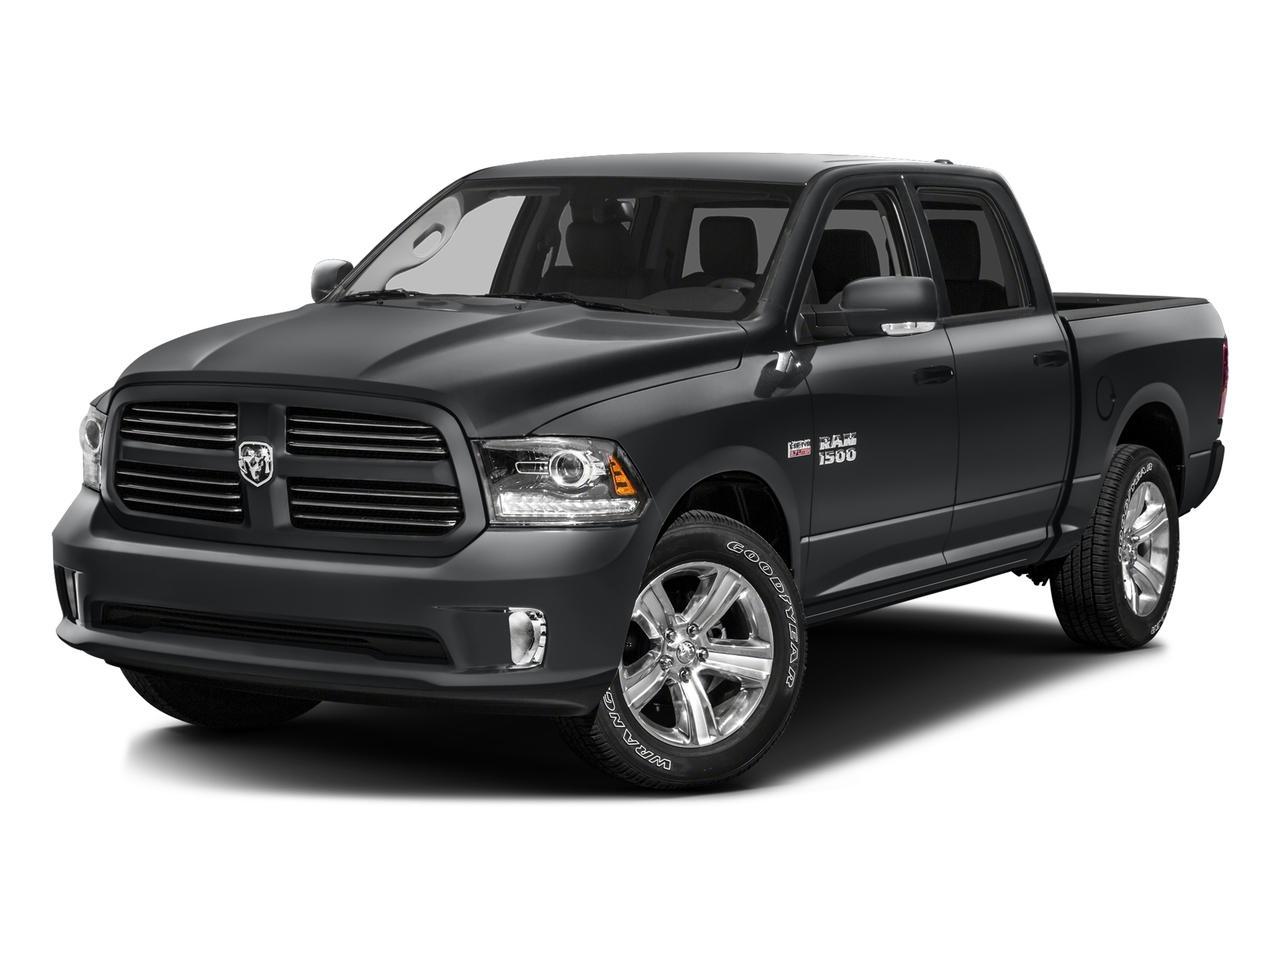 2016 Ram 1500 Vehicle Photo in Frisco, TX 75035